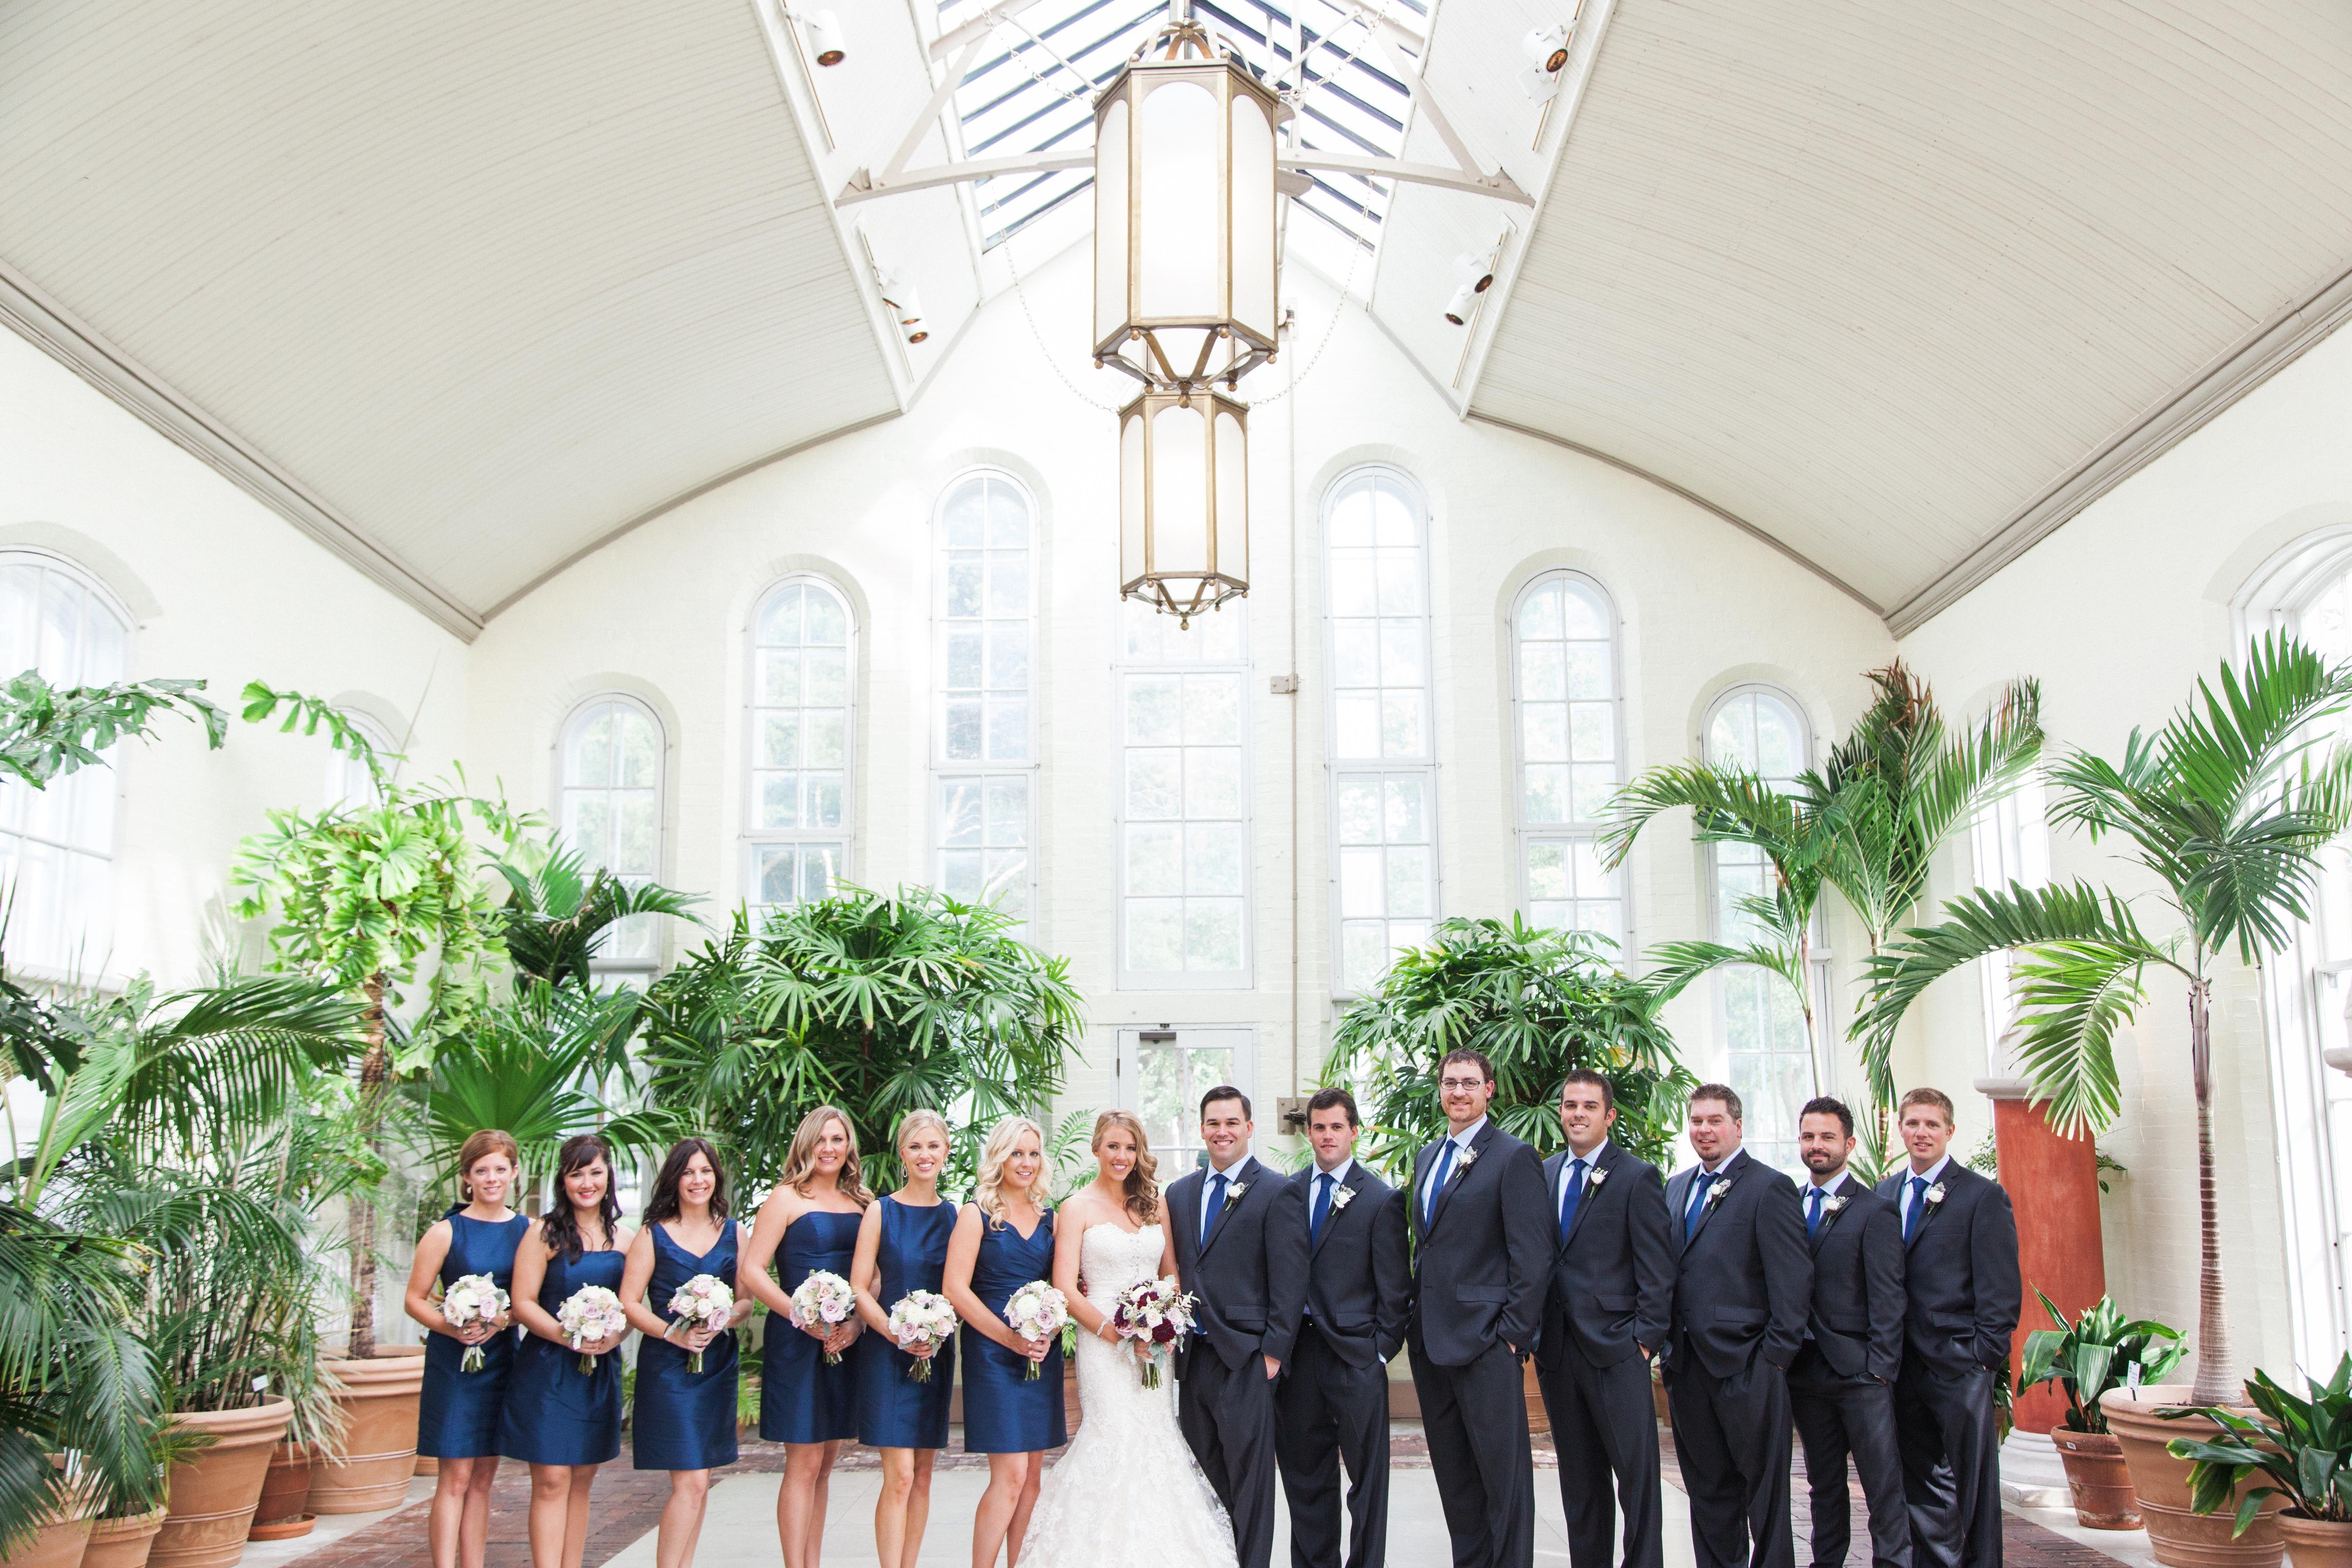 Navy Bridesmaid Dresses Charcoal Groomsmen Suits